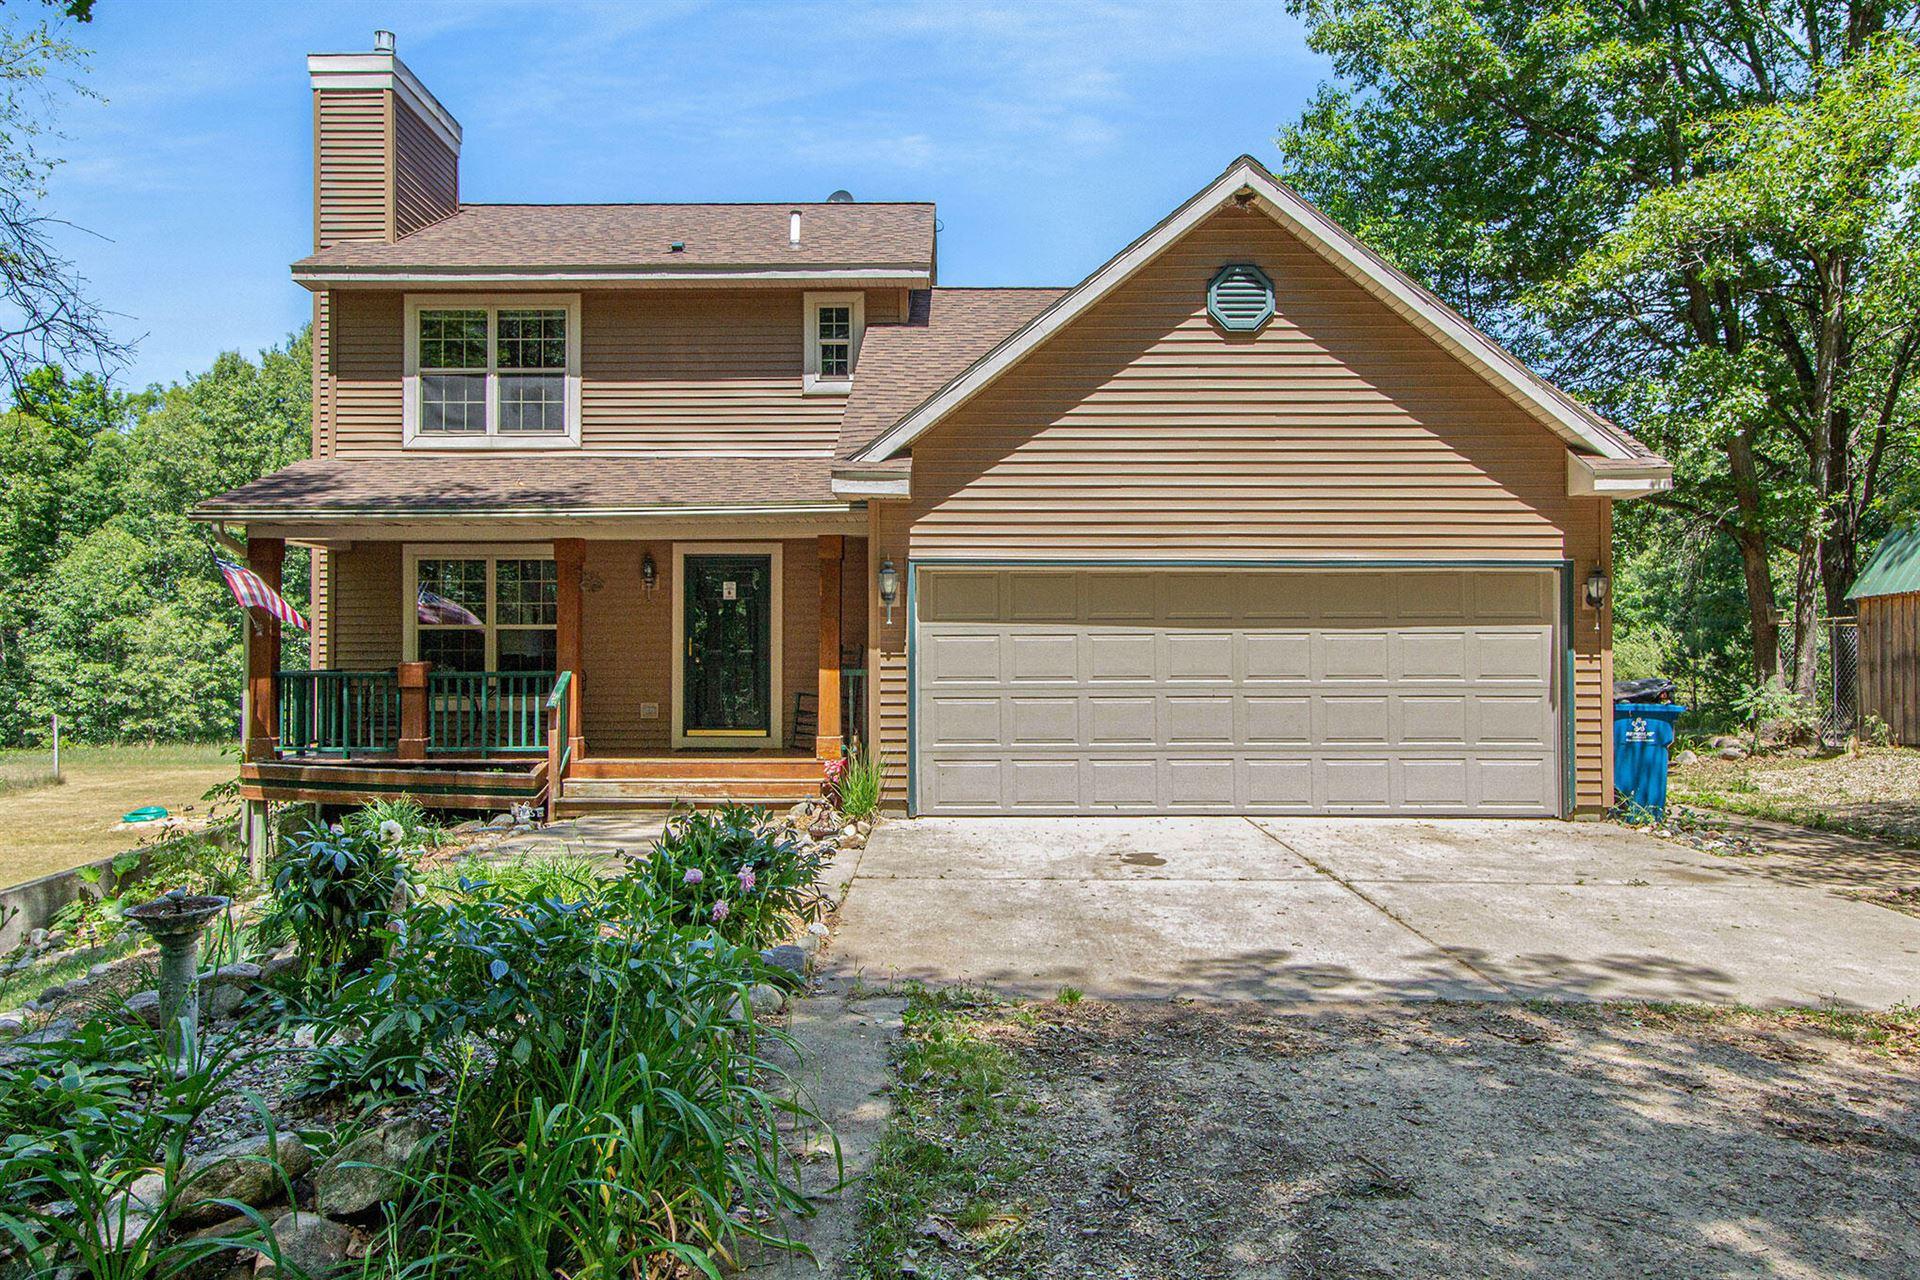 22544 W Wood Lake Road, Pierson, MI 49339 - MLS#: 21023500